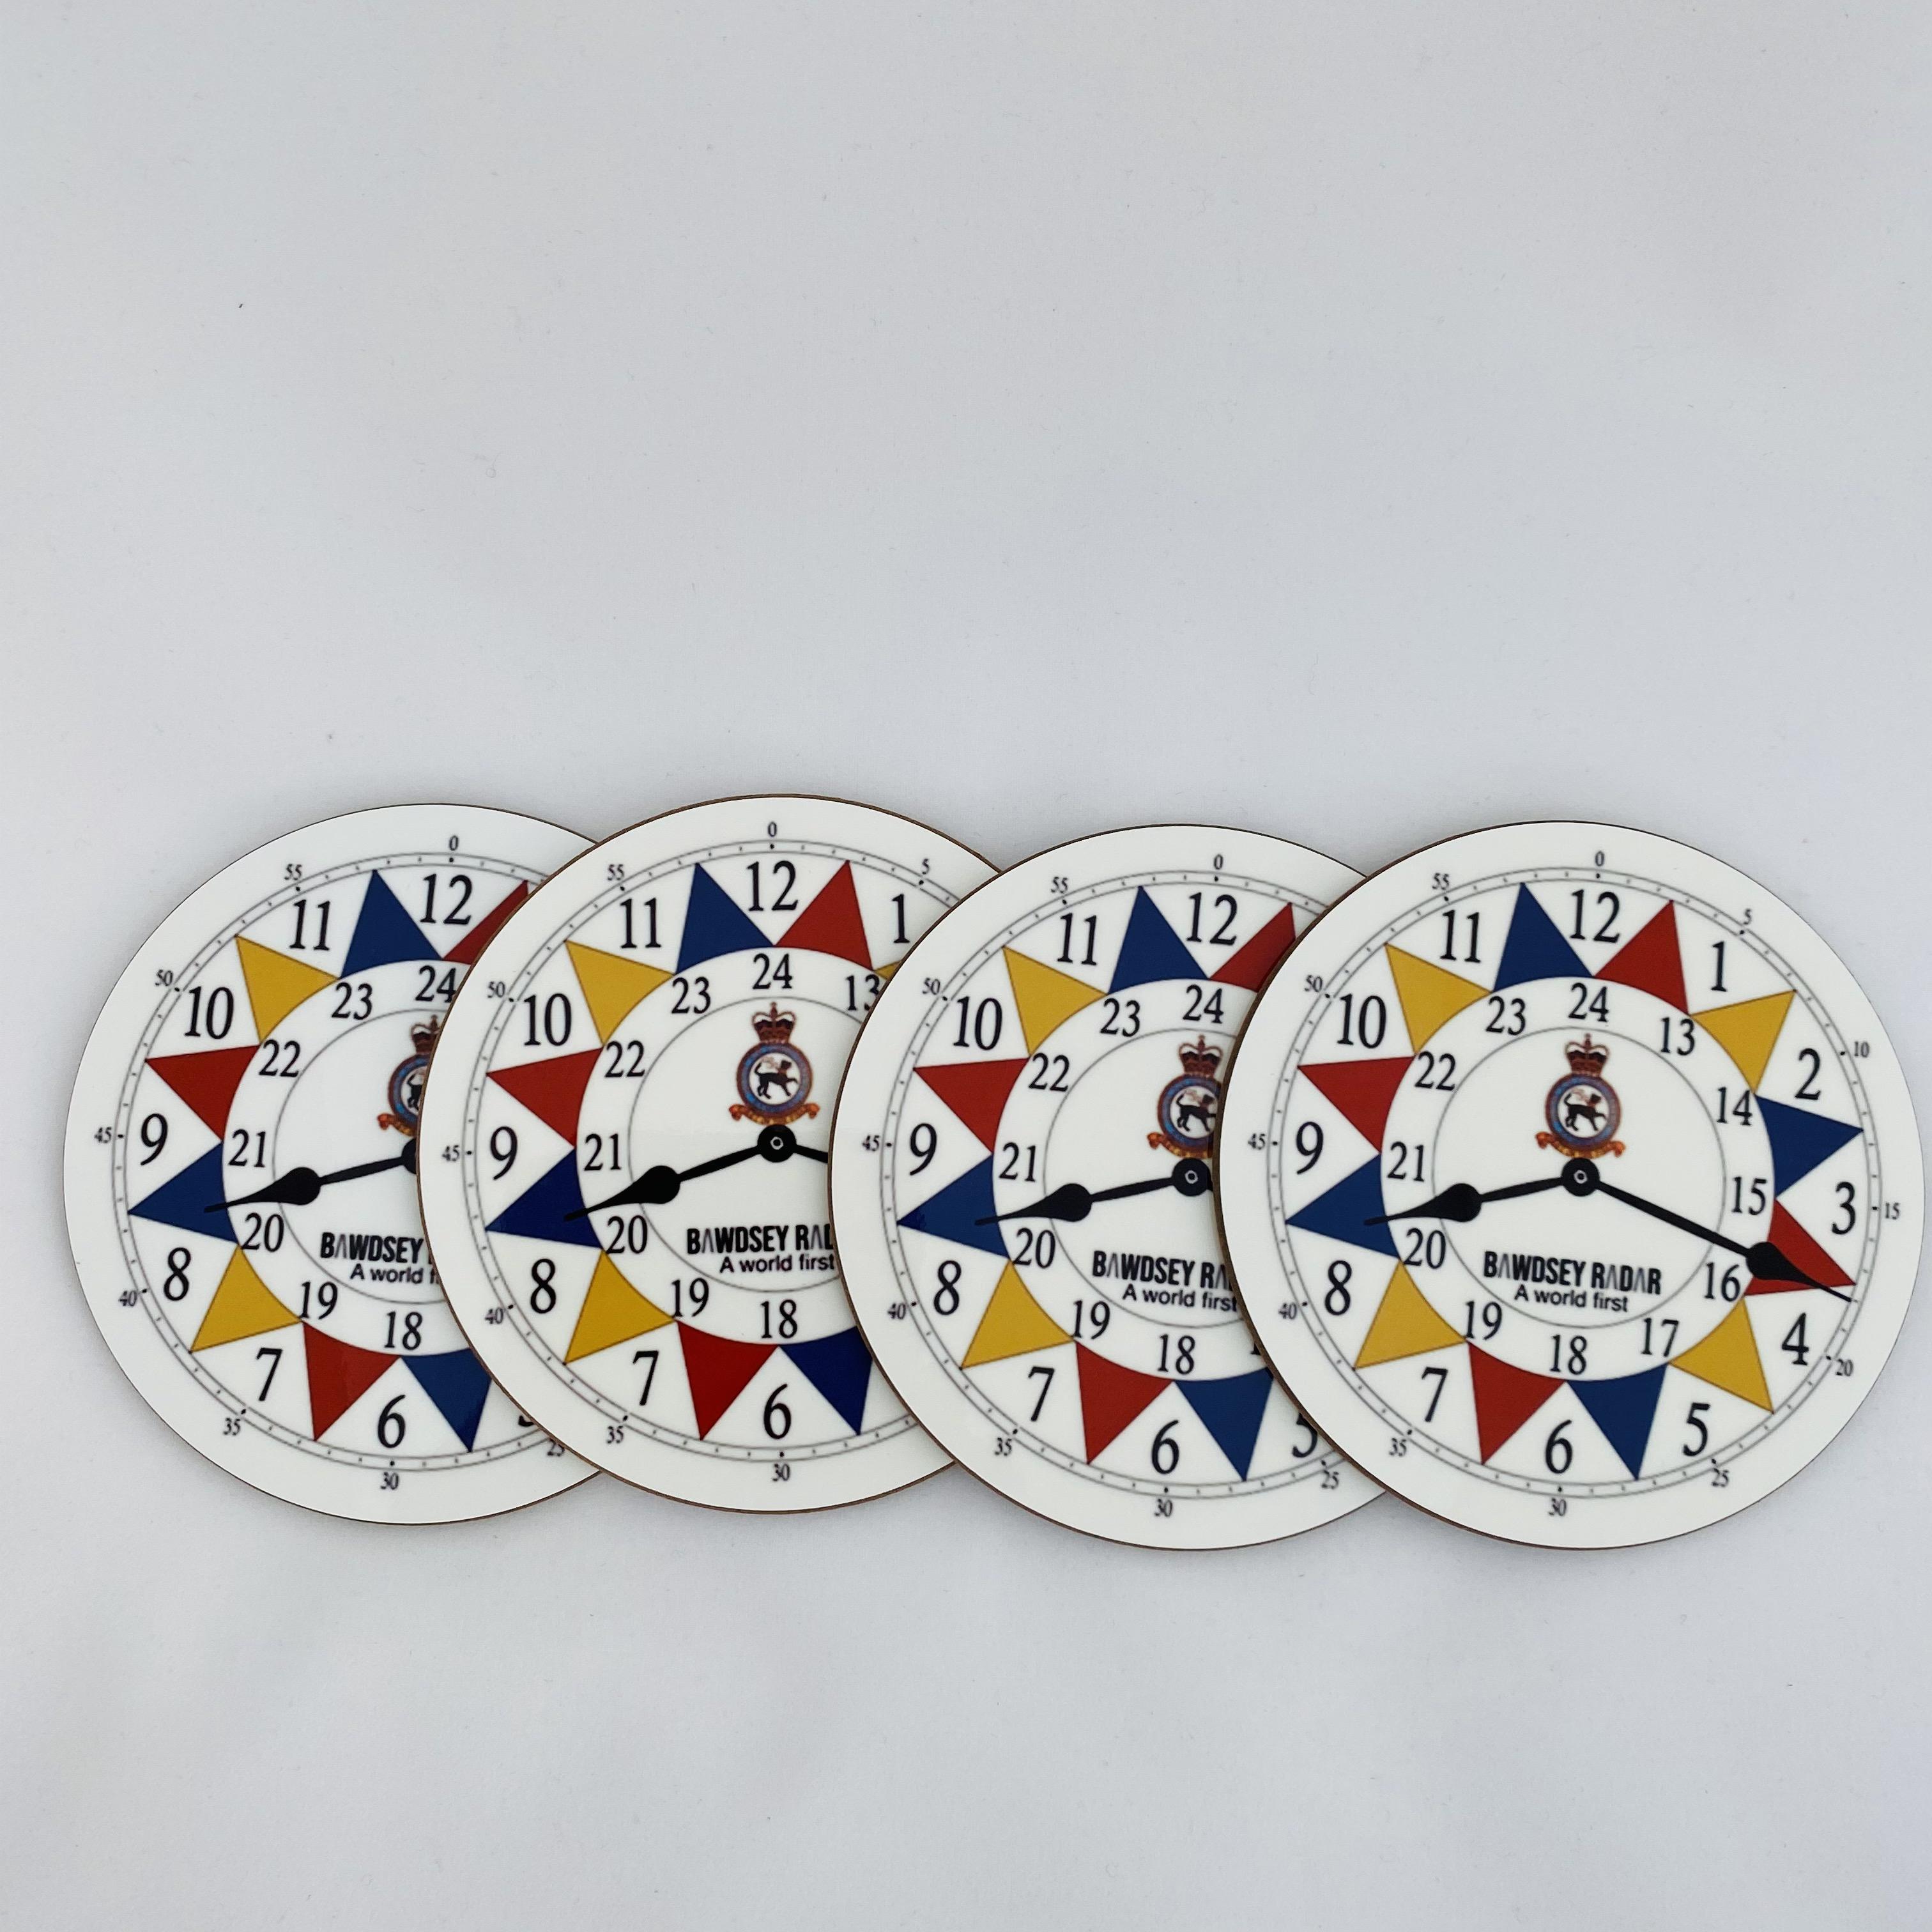 Coasters - set of 4